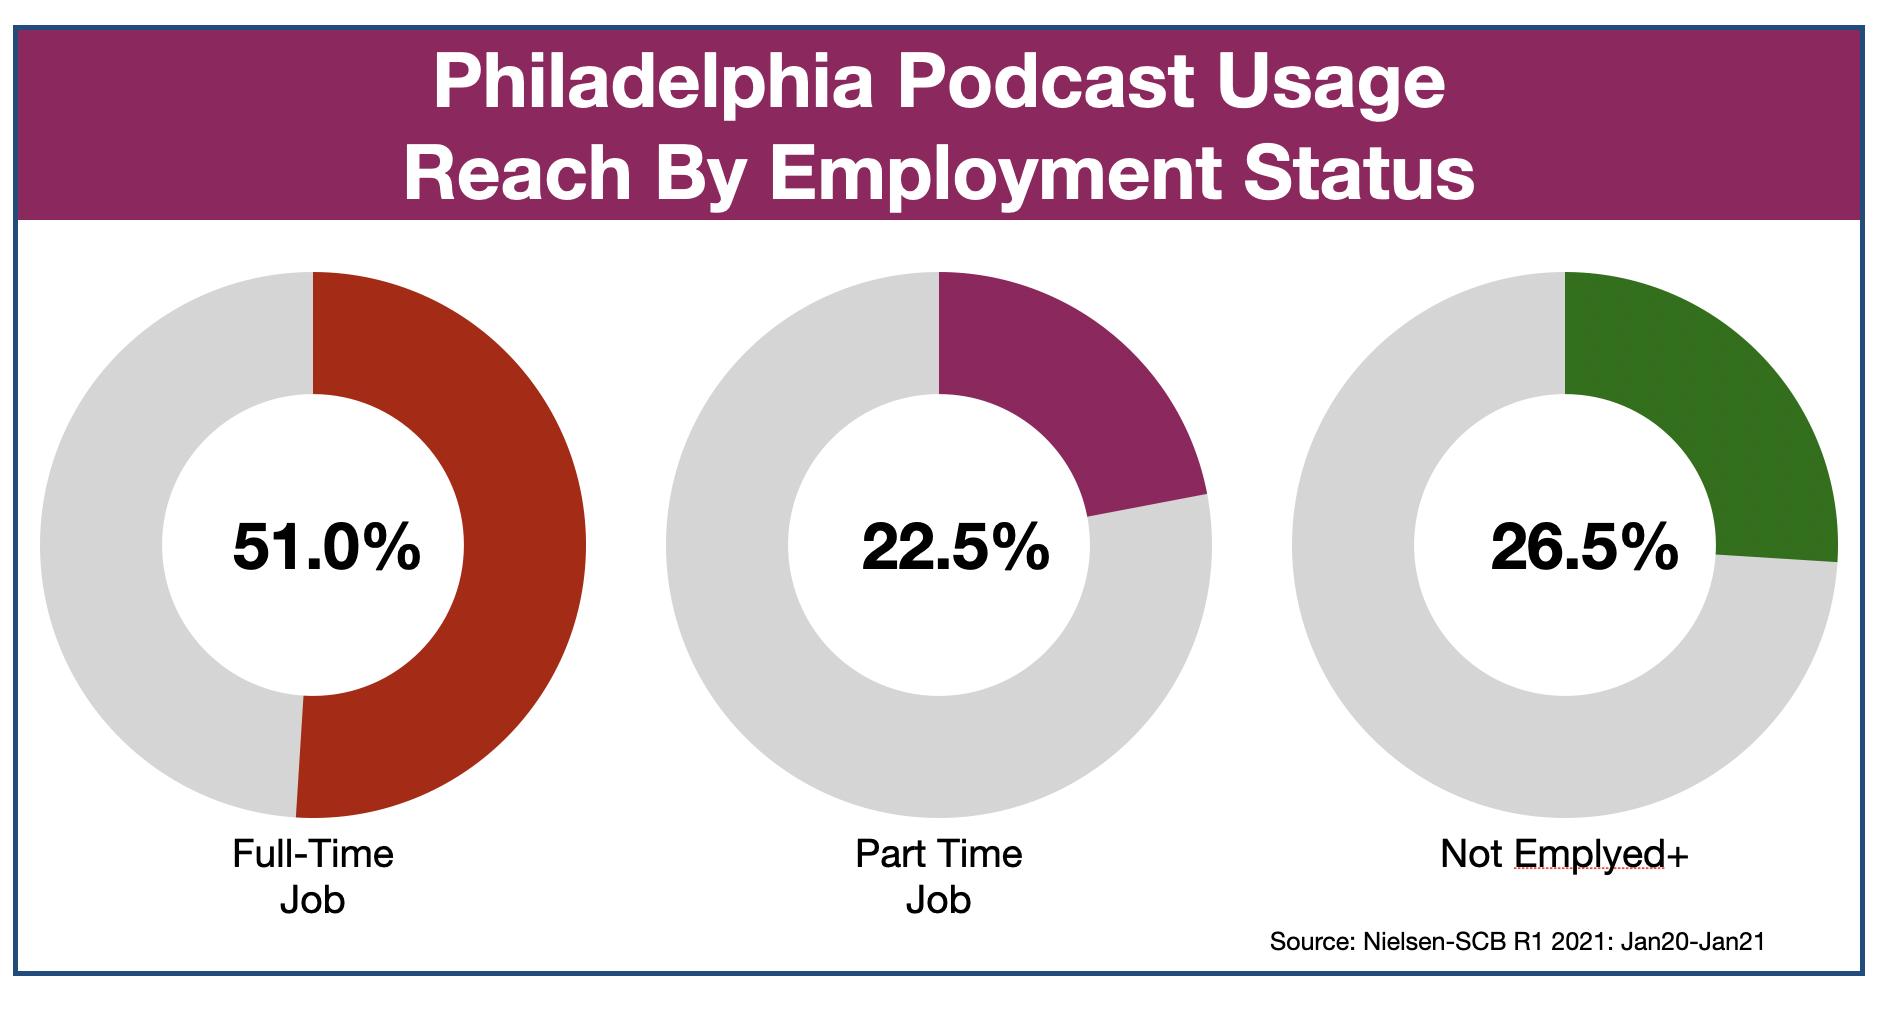 Podcast Advertising In Philadelphia Employment